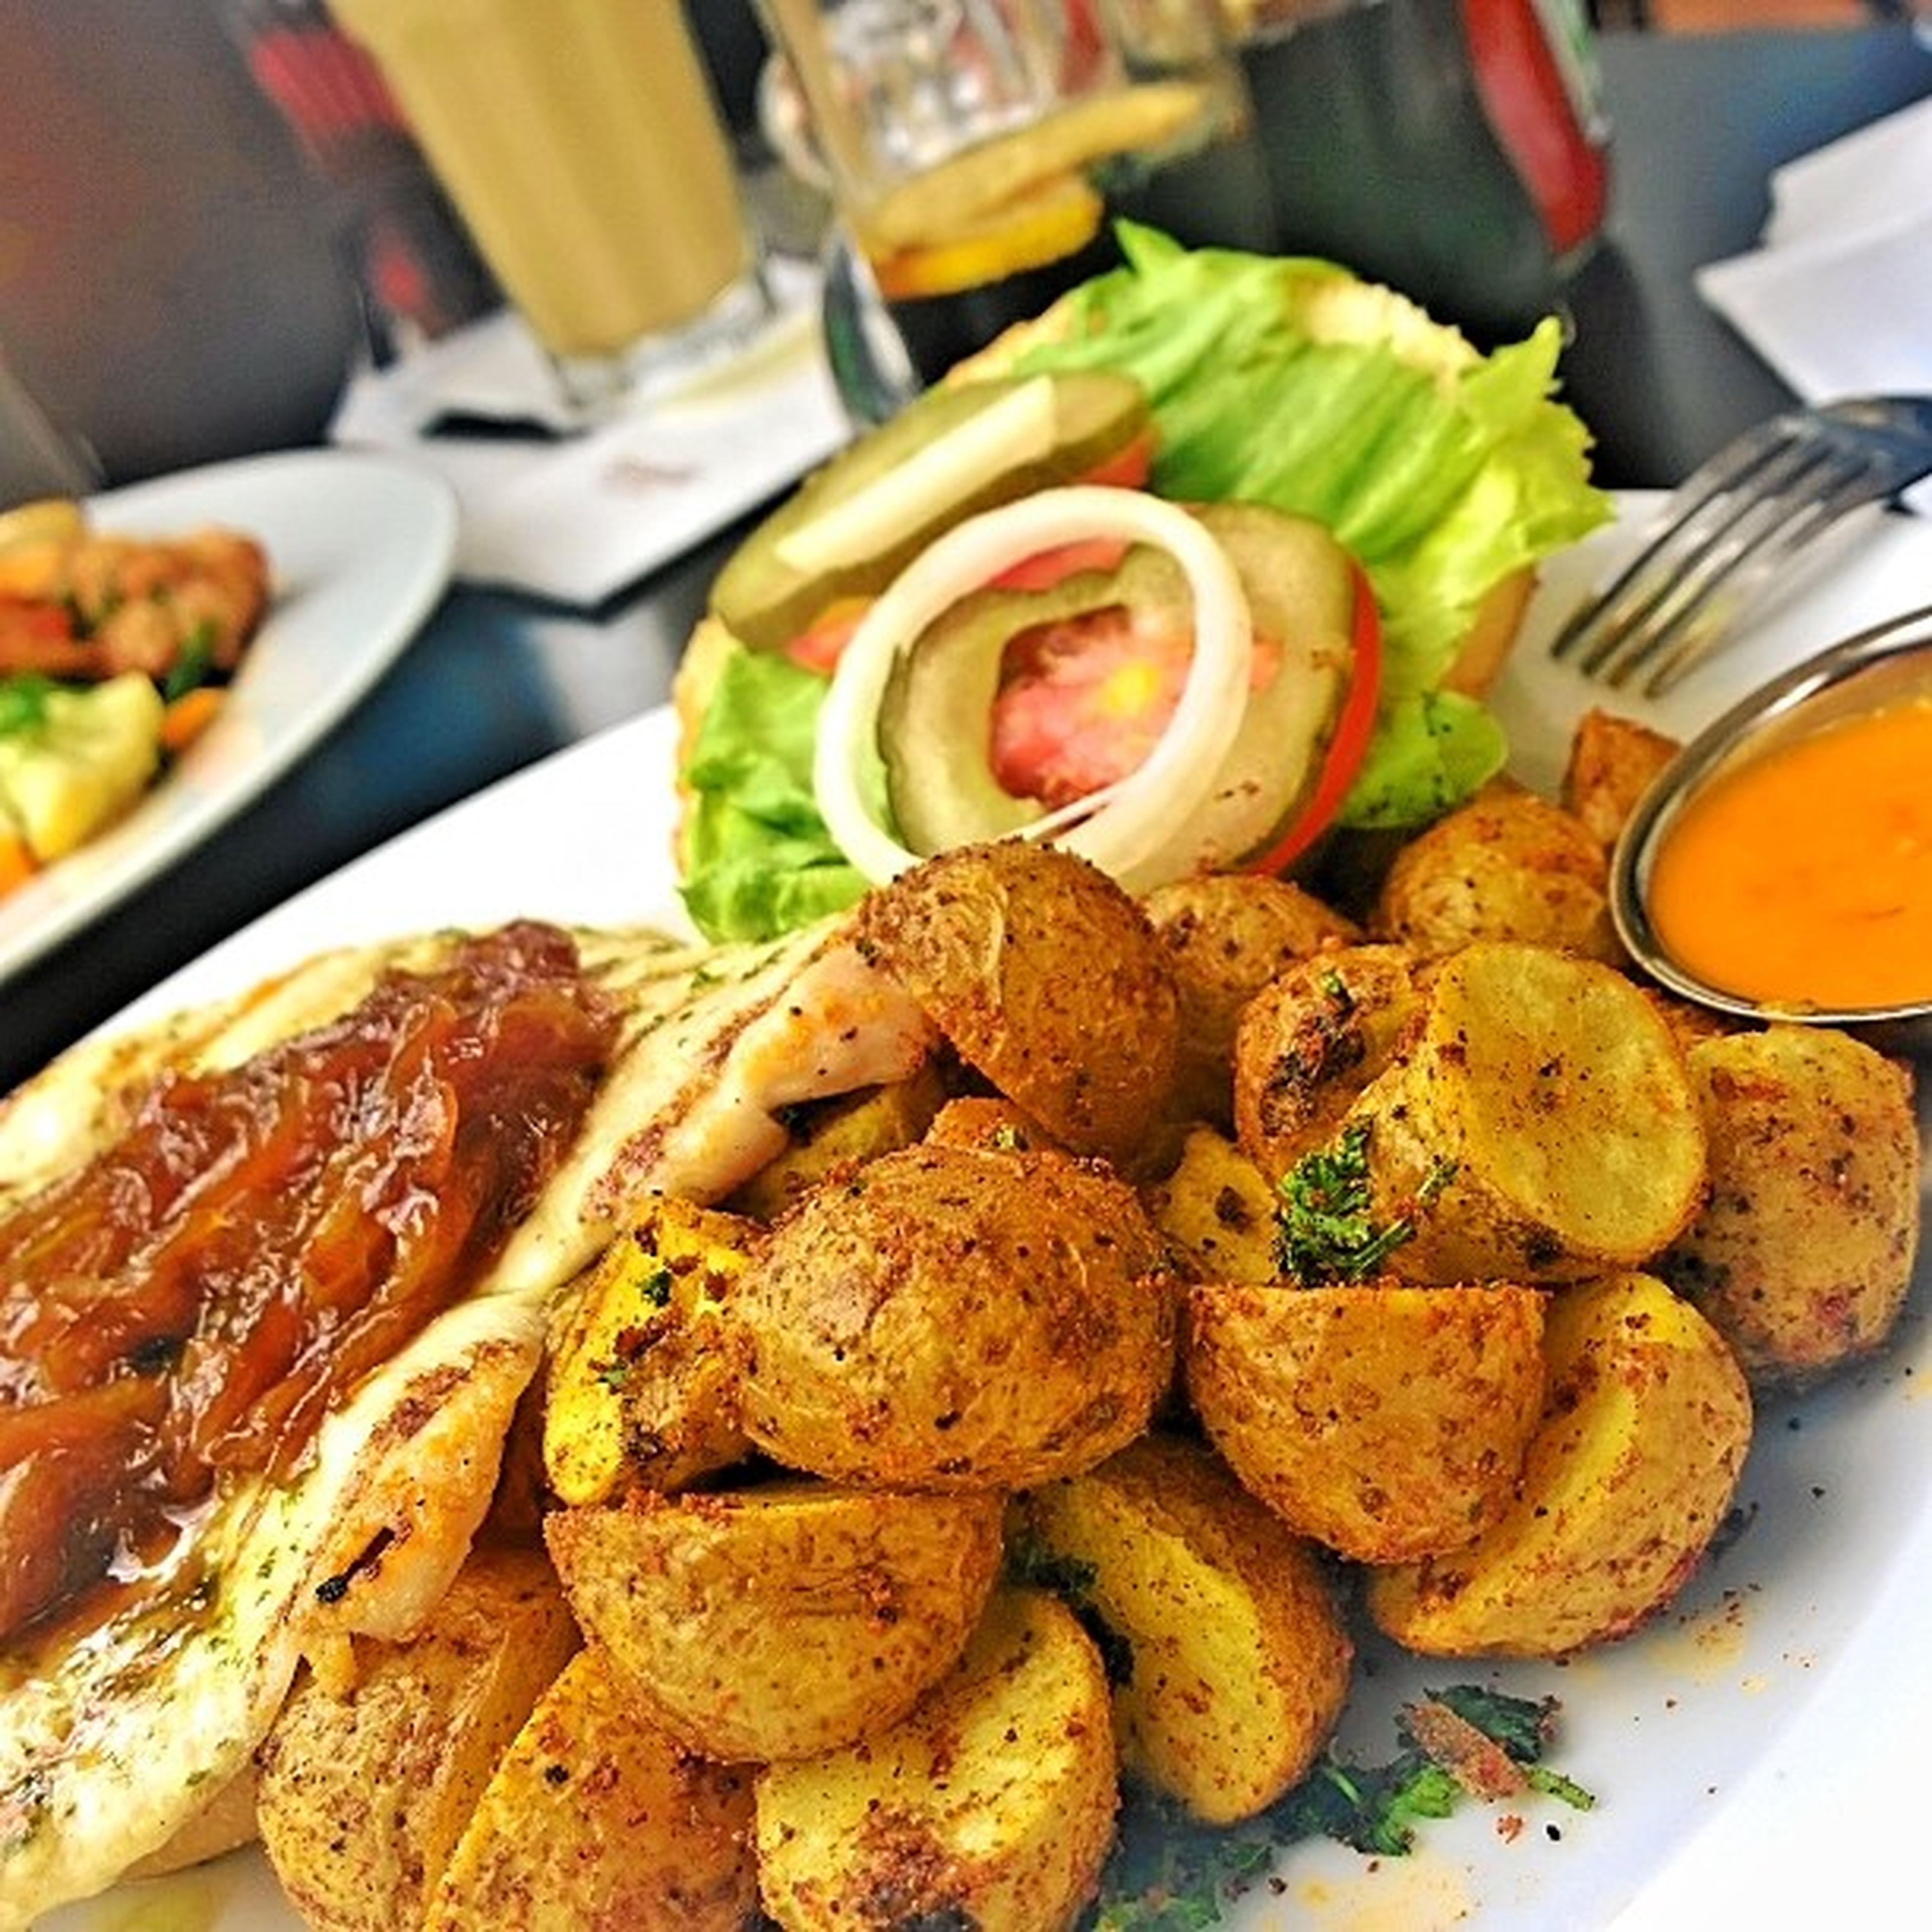 Somewhere in Nairobi Wheretheresfood Foodie BabyPotatoes lunch getyummy burger photography @eatoutkenya nokia1020 lumia1020 crisp pixels